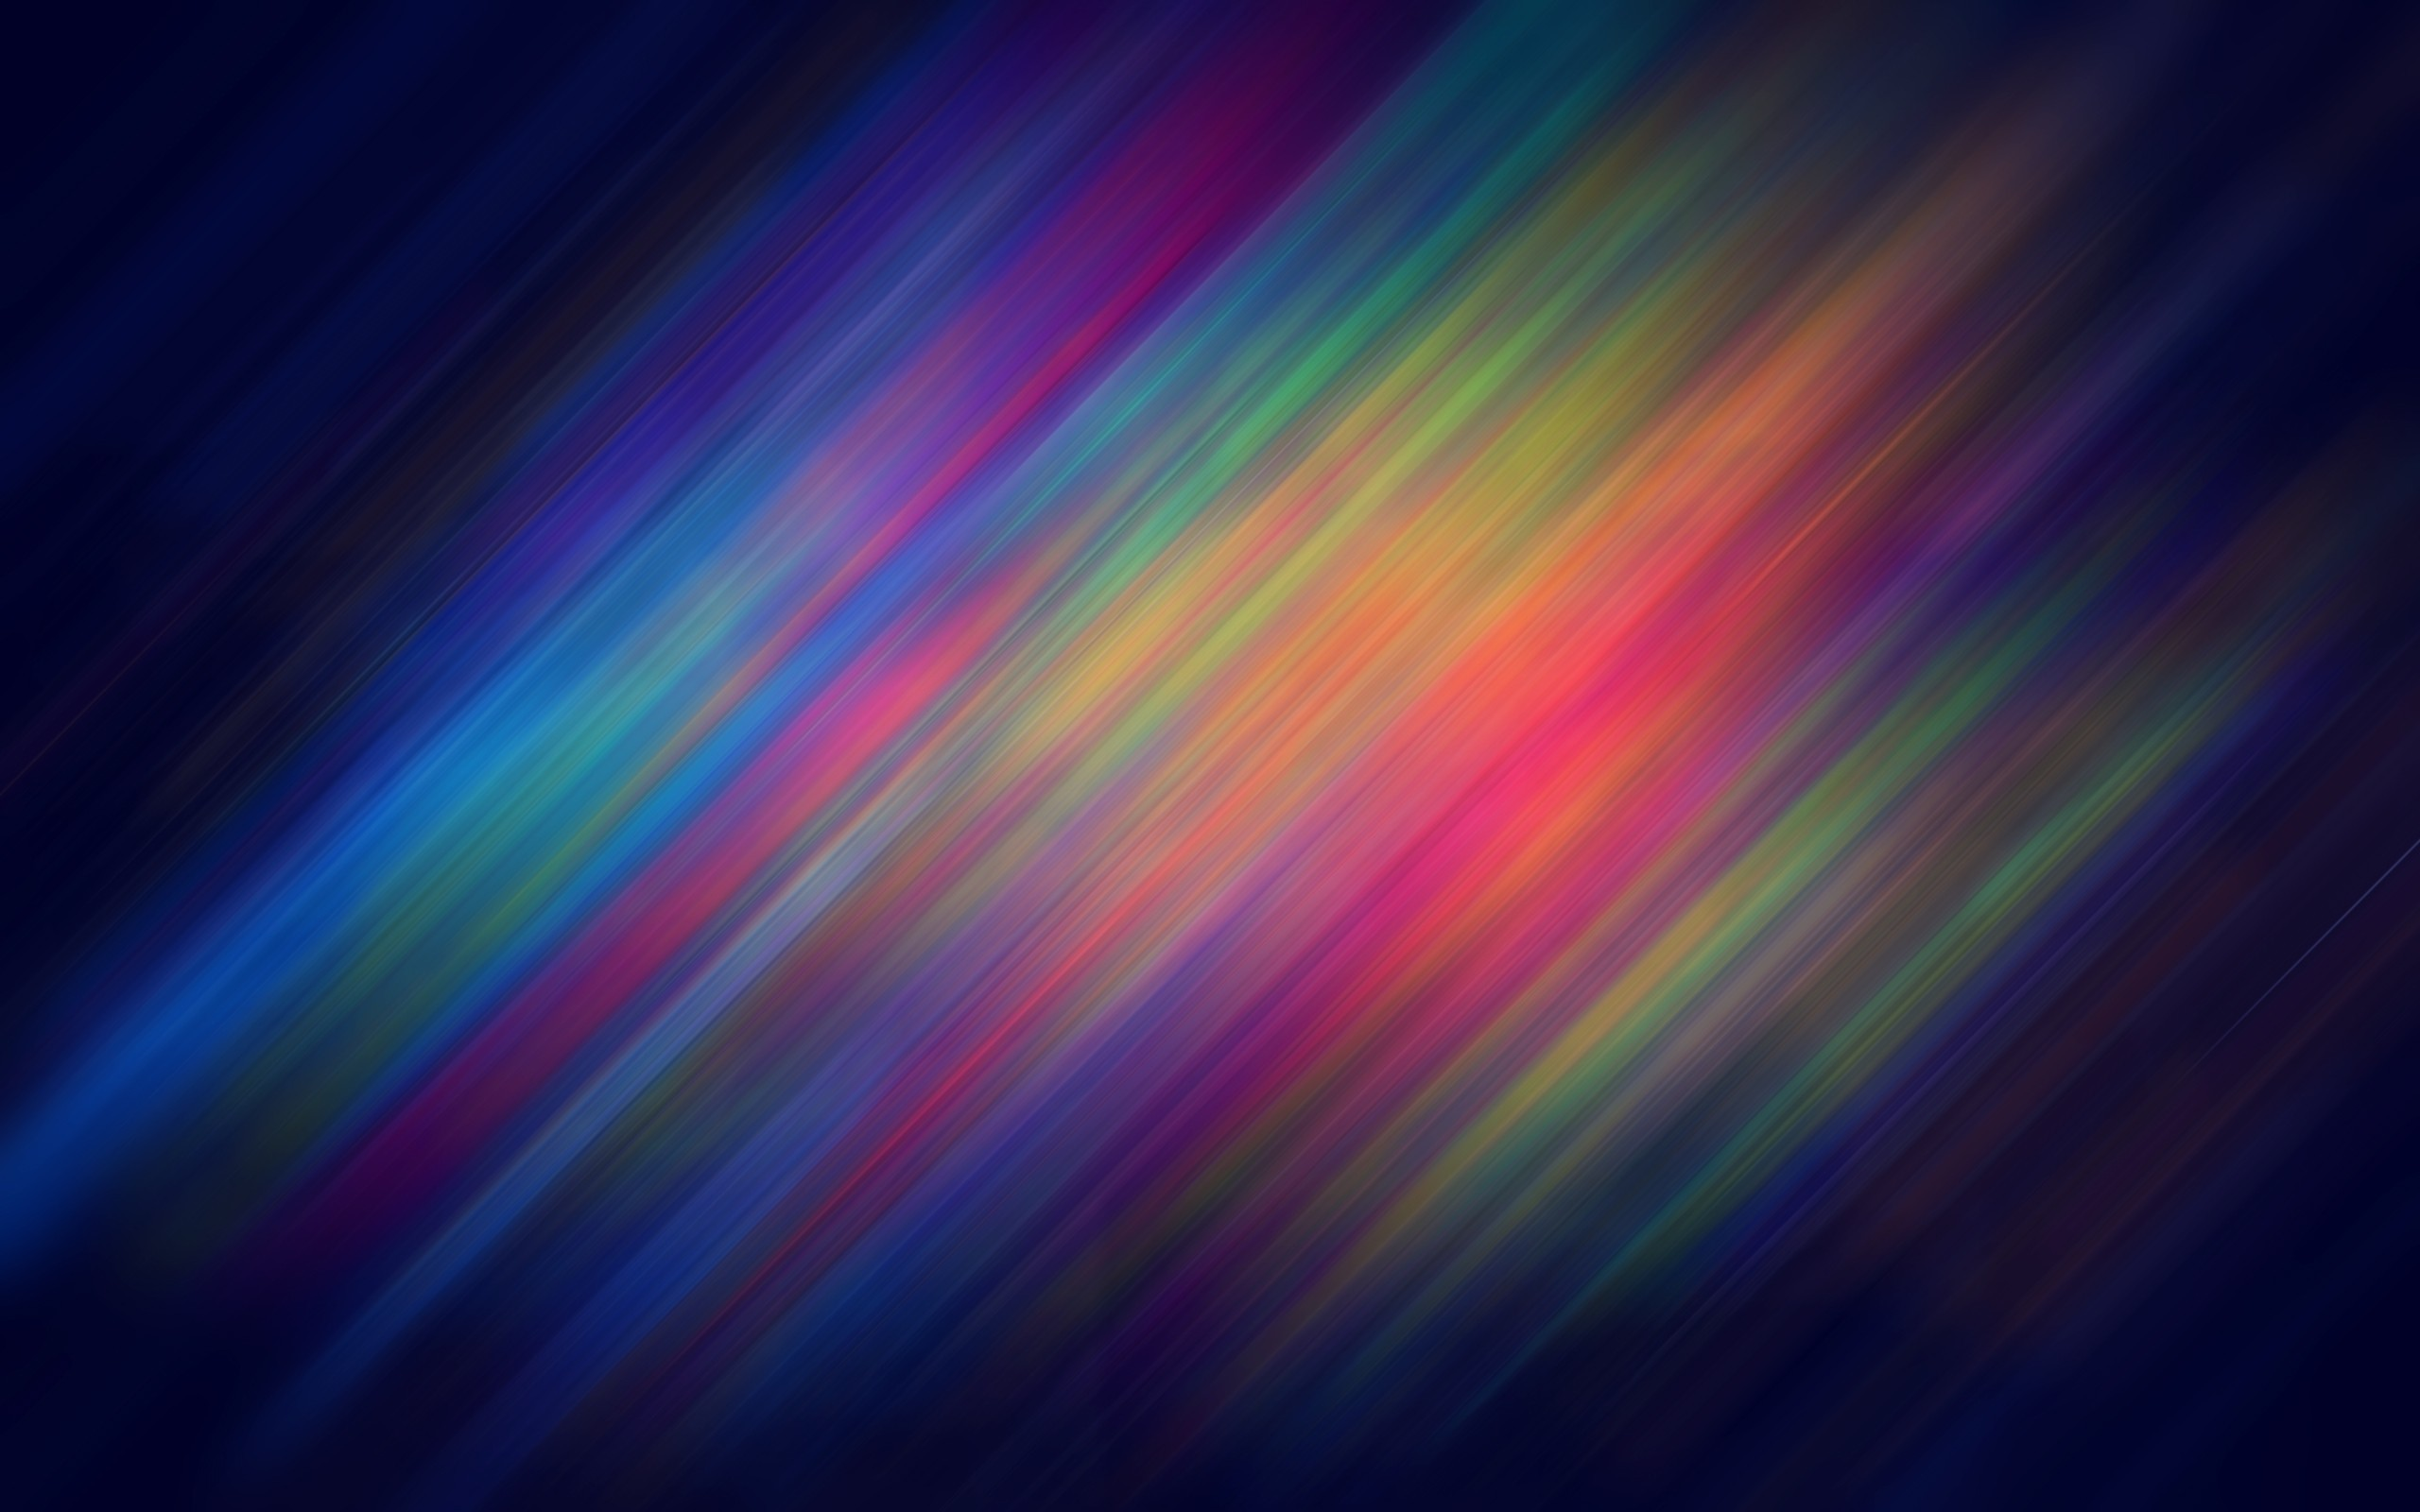 Wallpaper Rainbow, Colorful, Cross, Lines